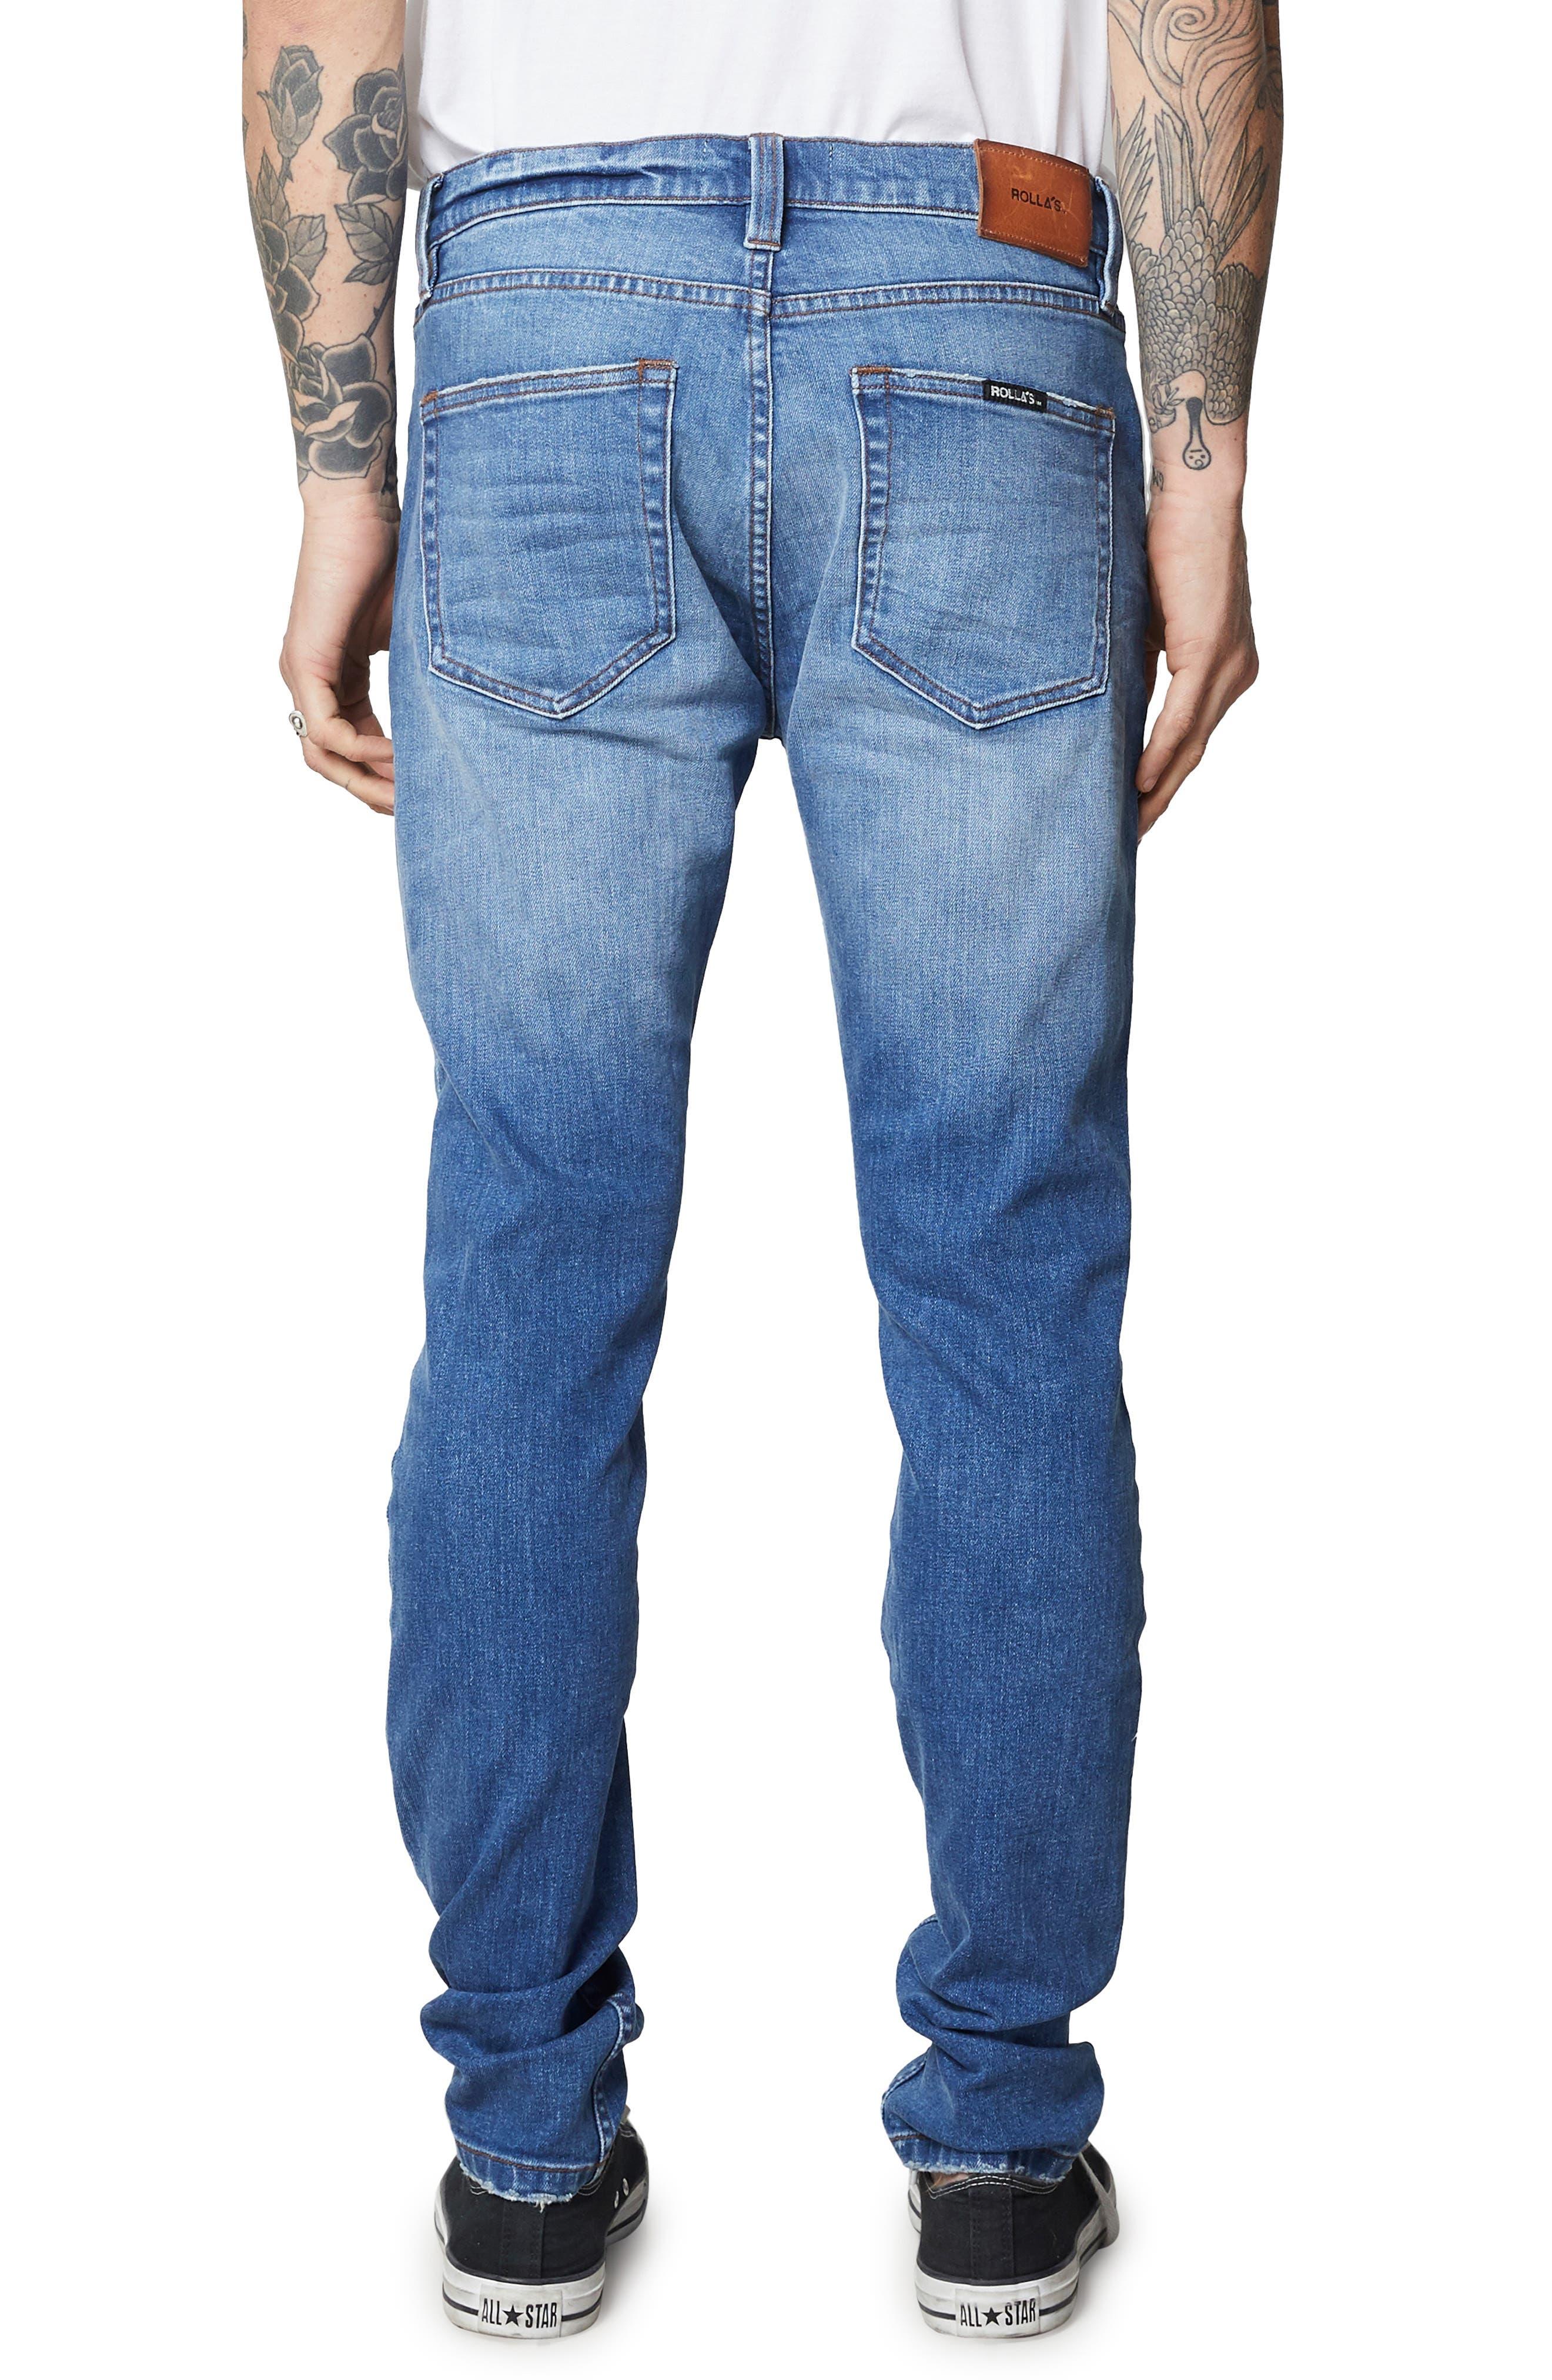 Stinger Skinny Fit Jeans,                             Alternate thumbnail 2, color,                             HOMESPUN CRUSH